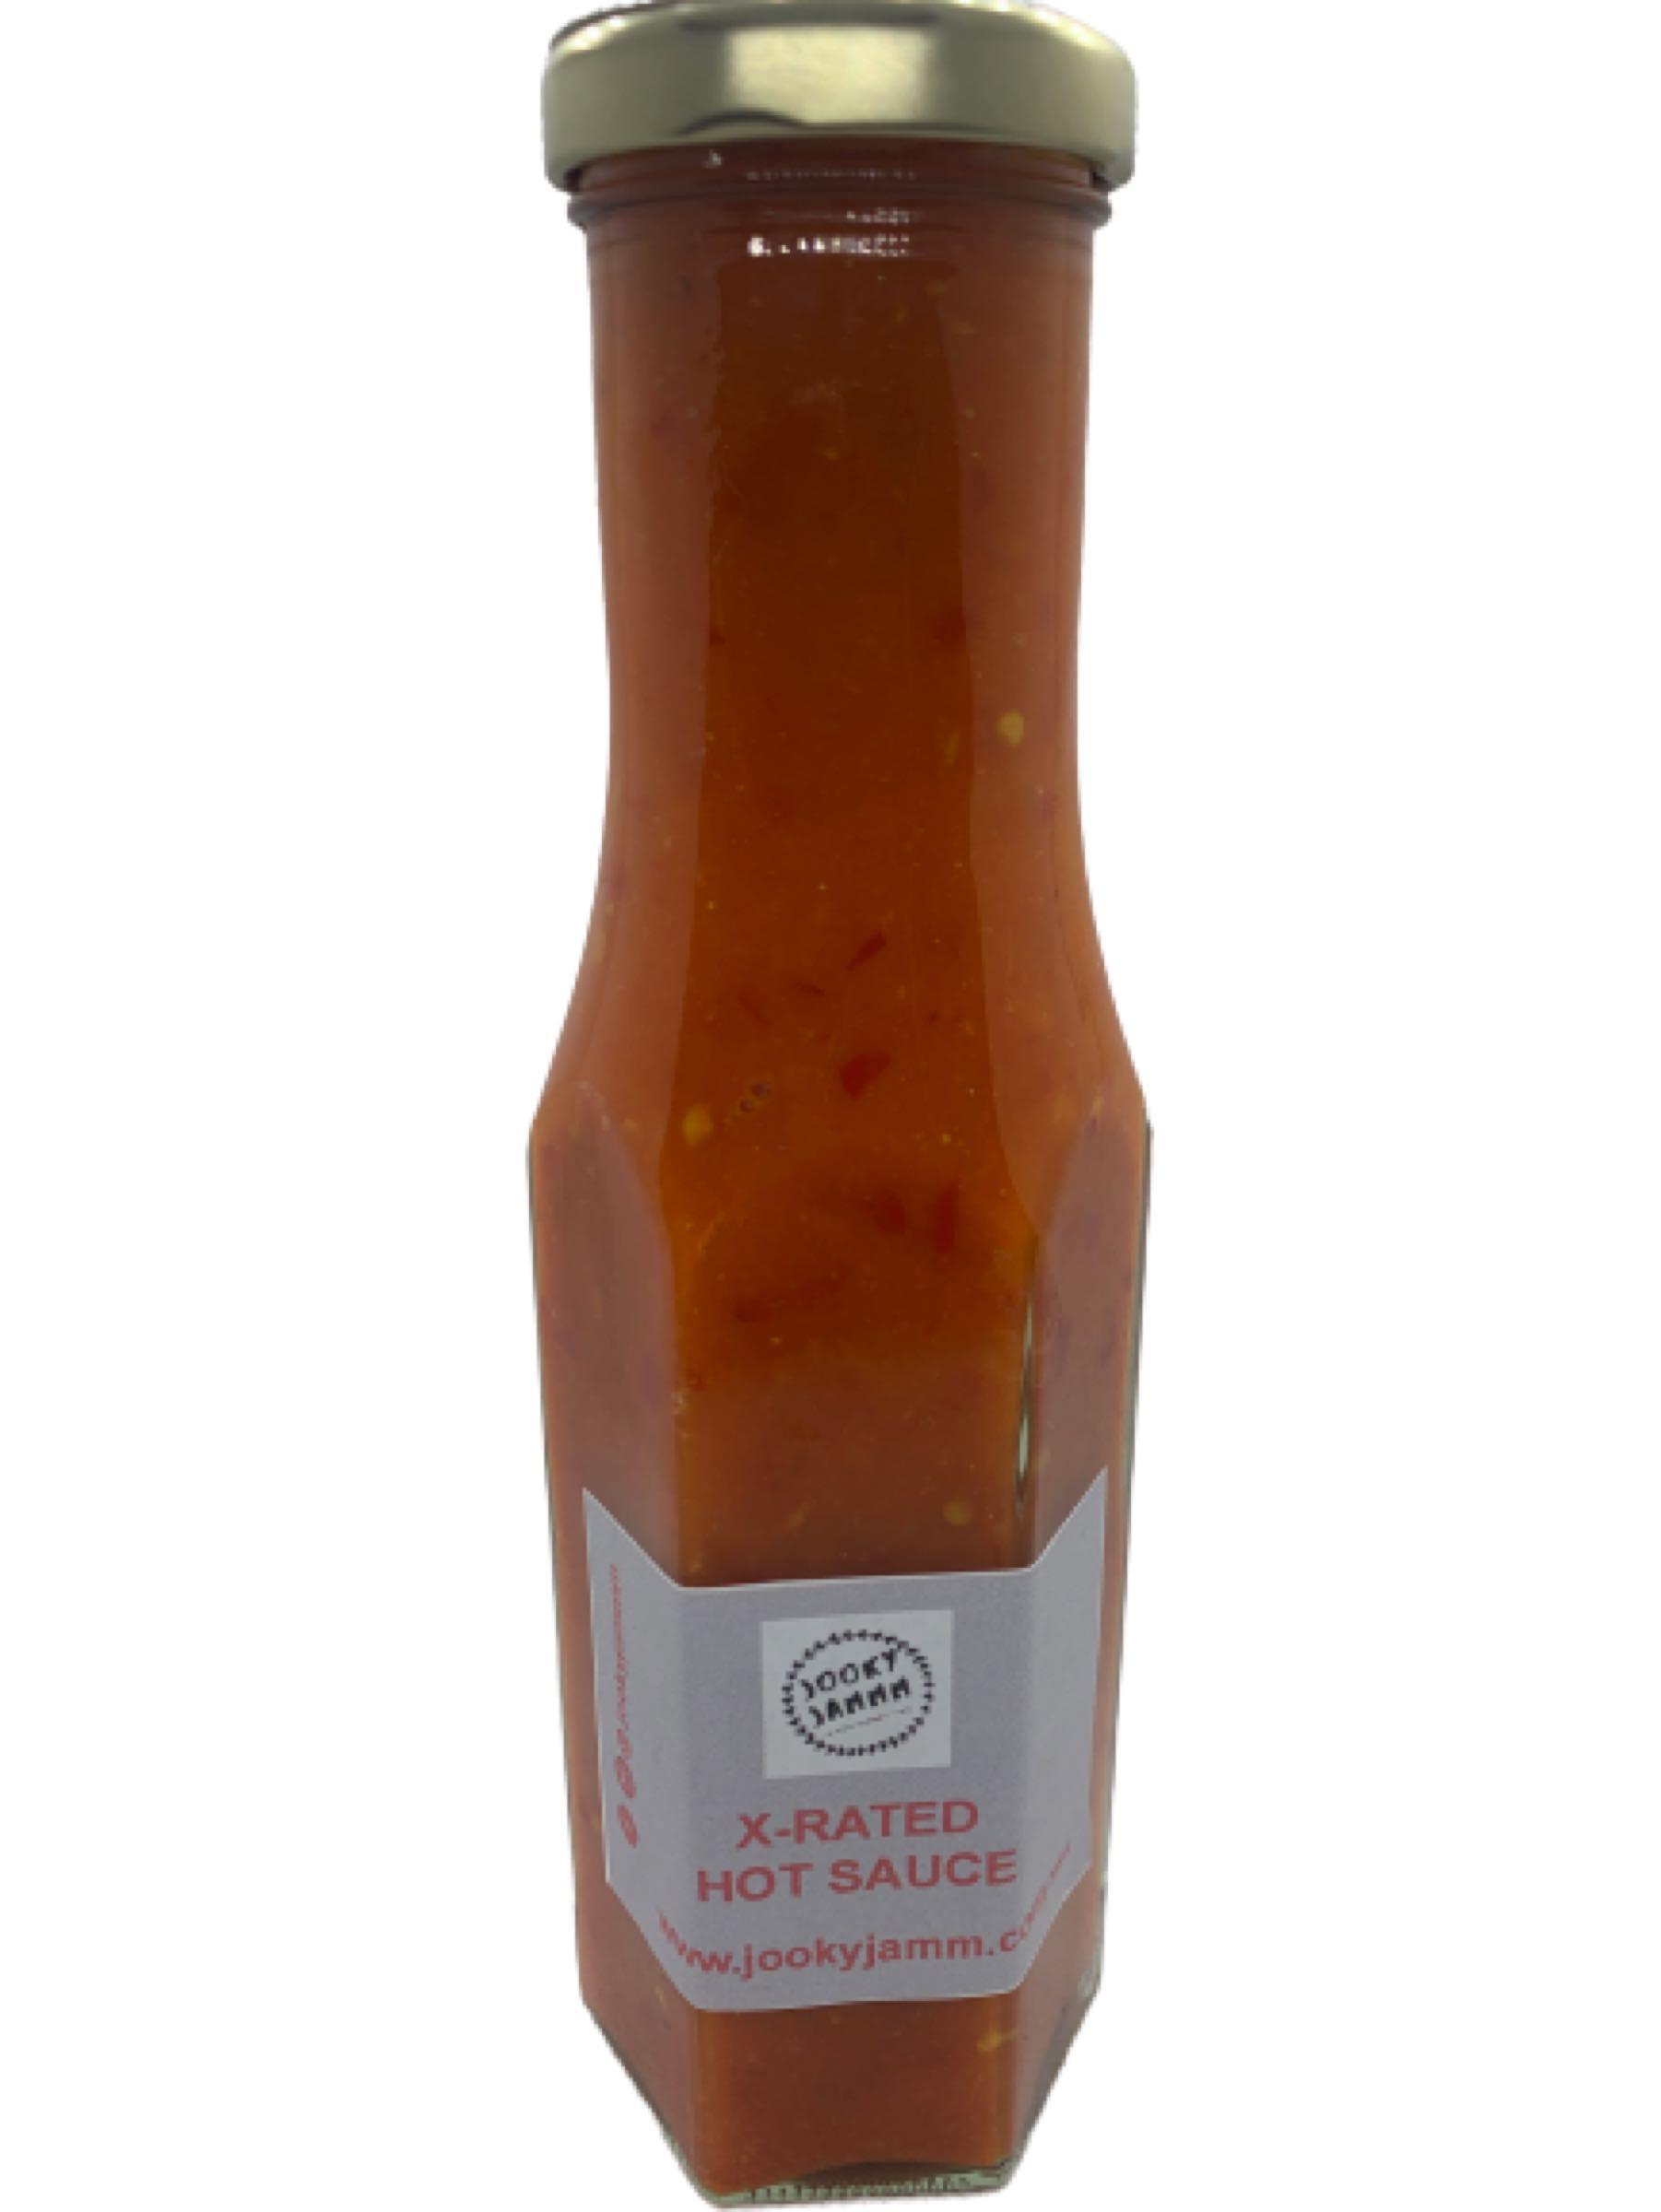 Jooky jammm X-rated hot sauce